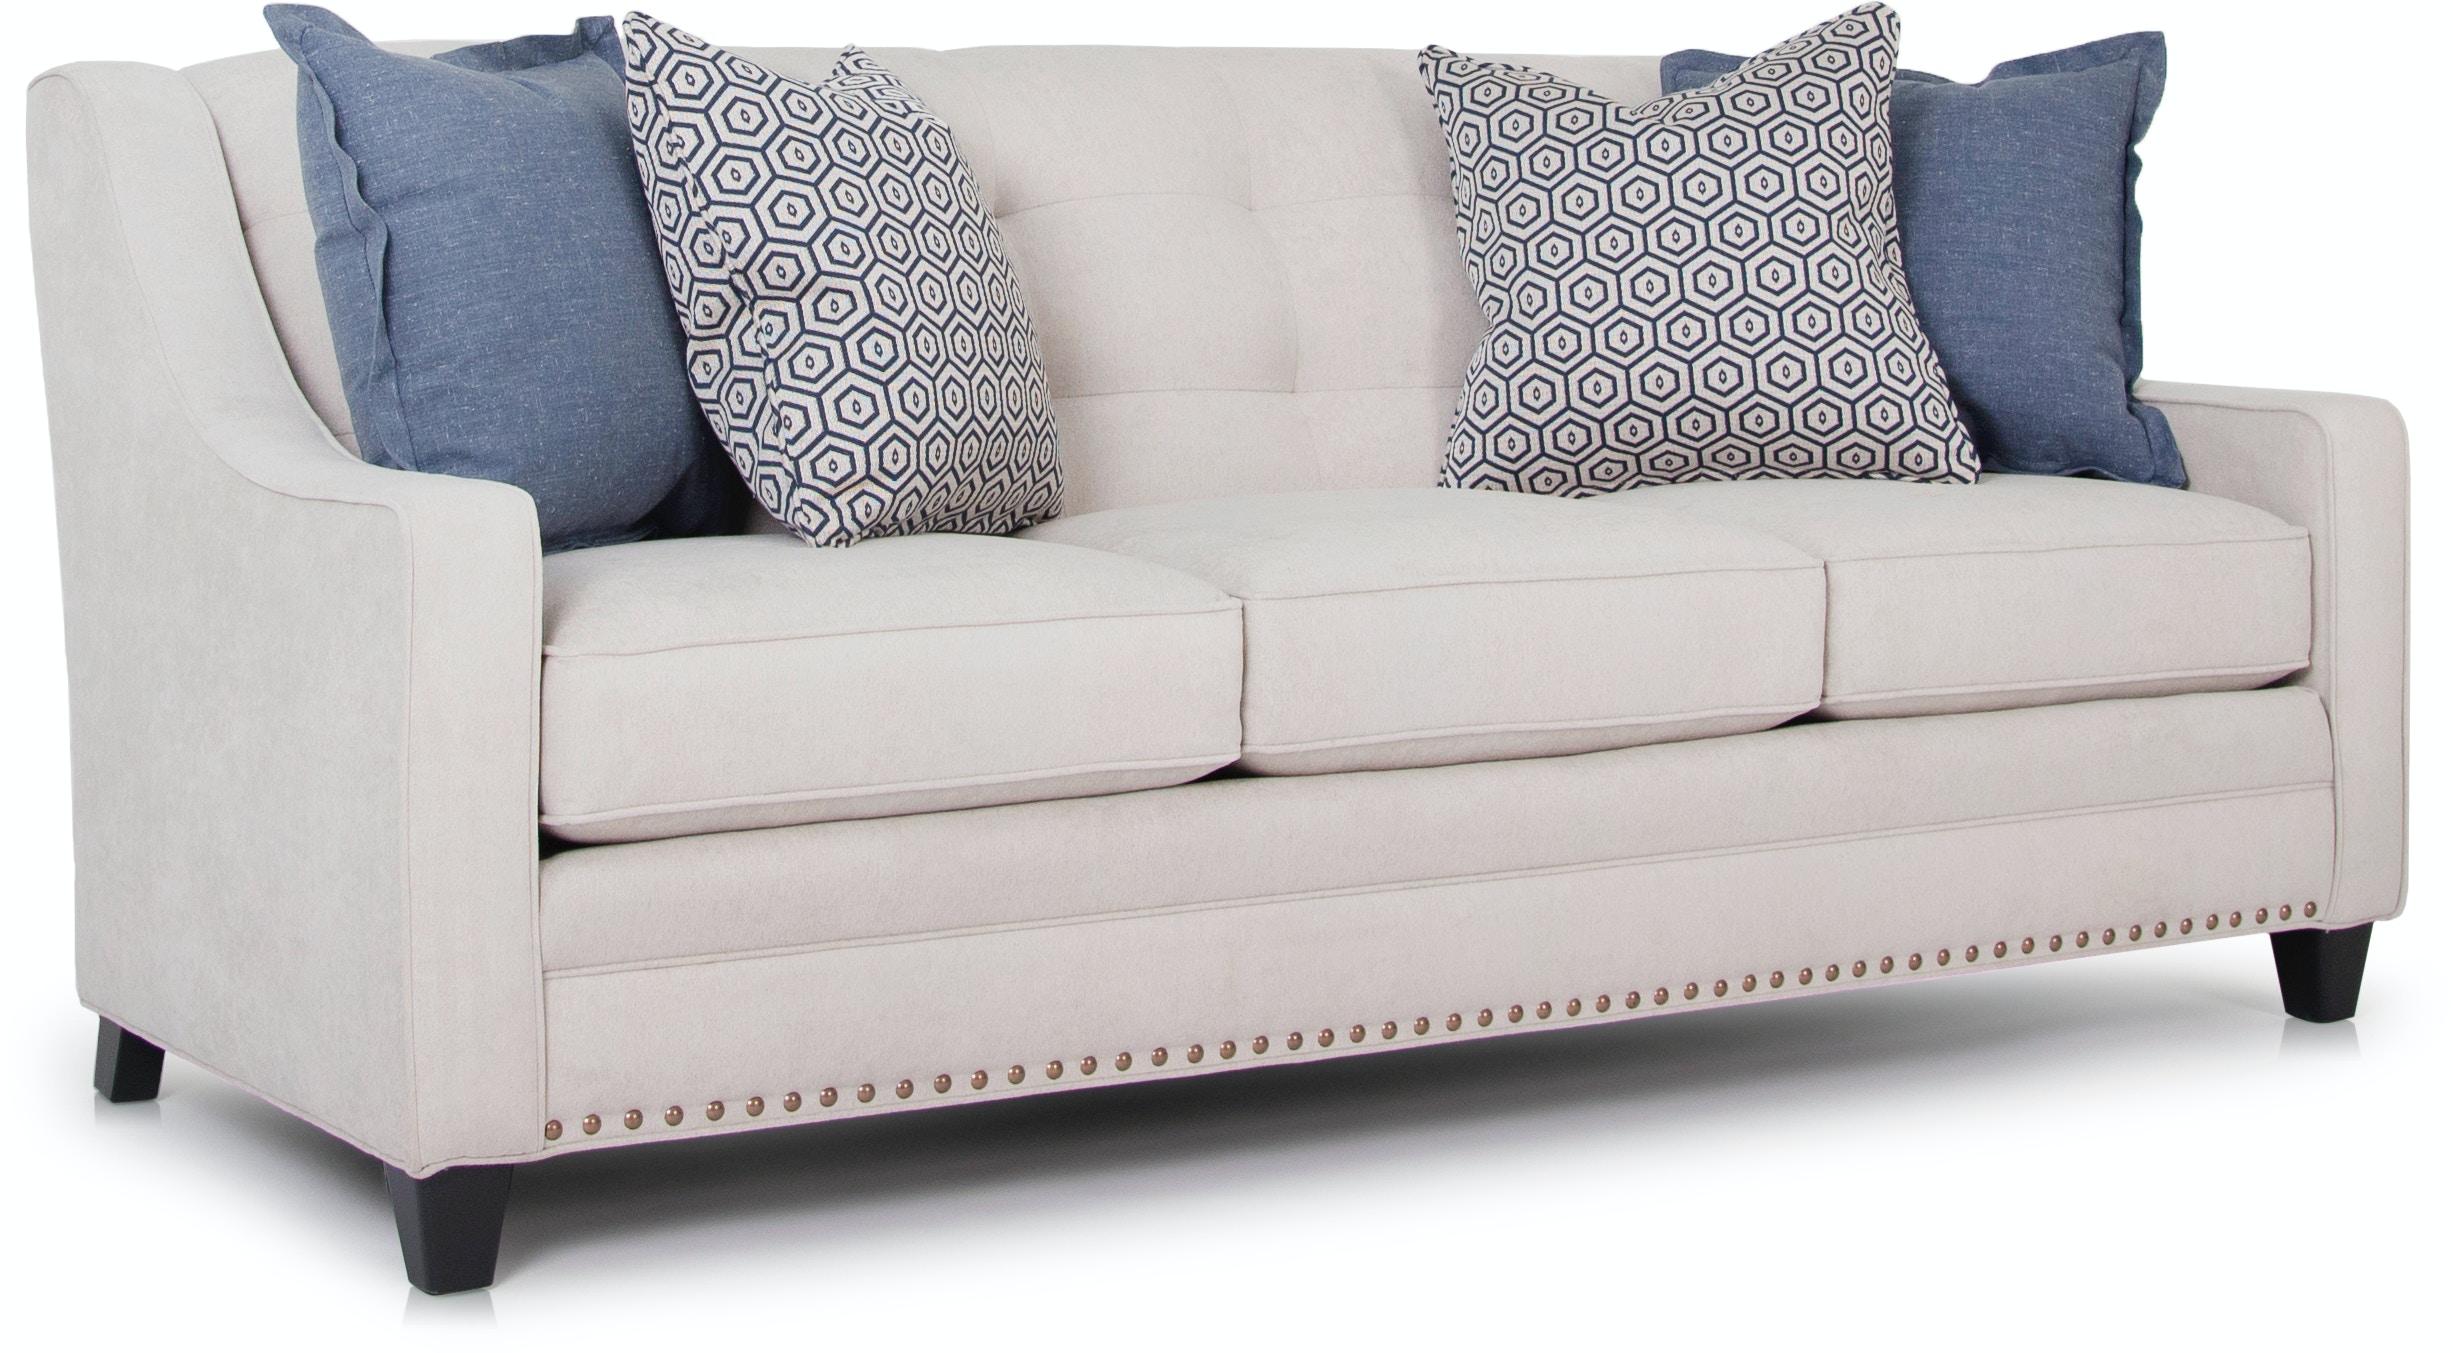 Smith Brothers Sofa 203 10